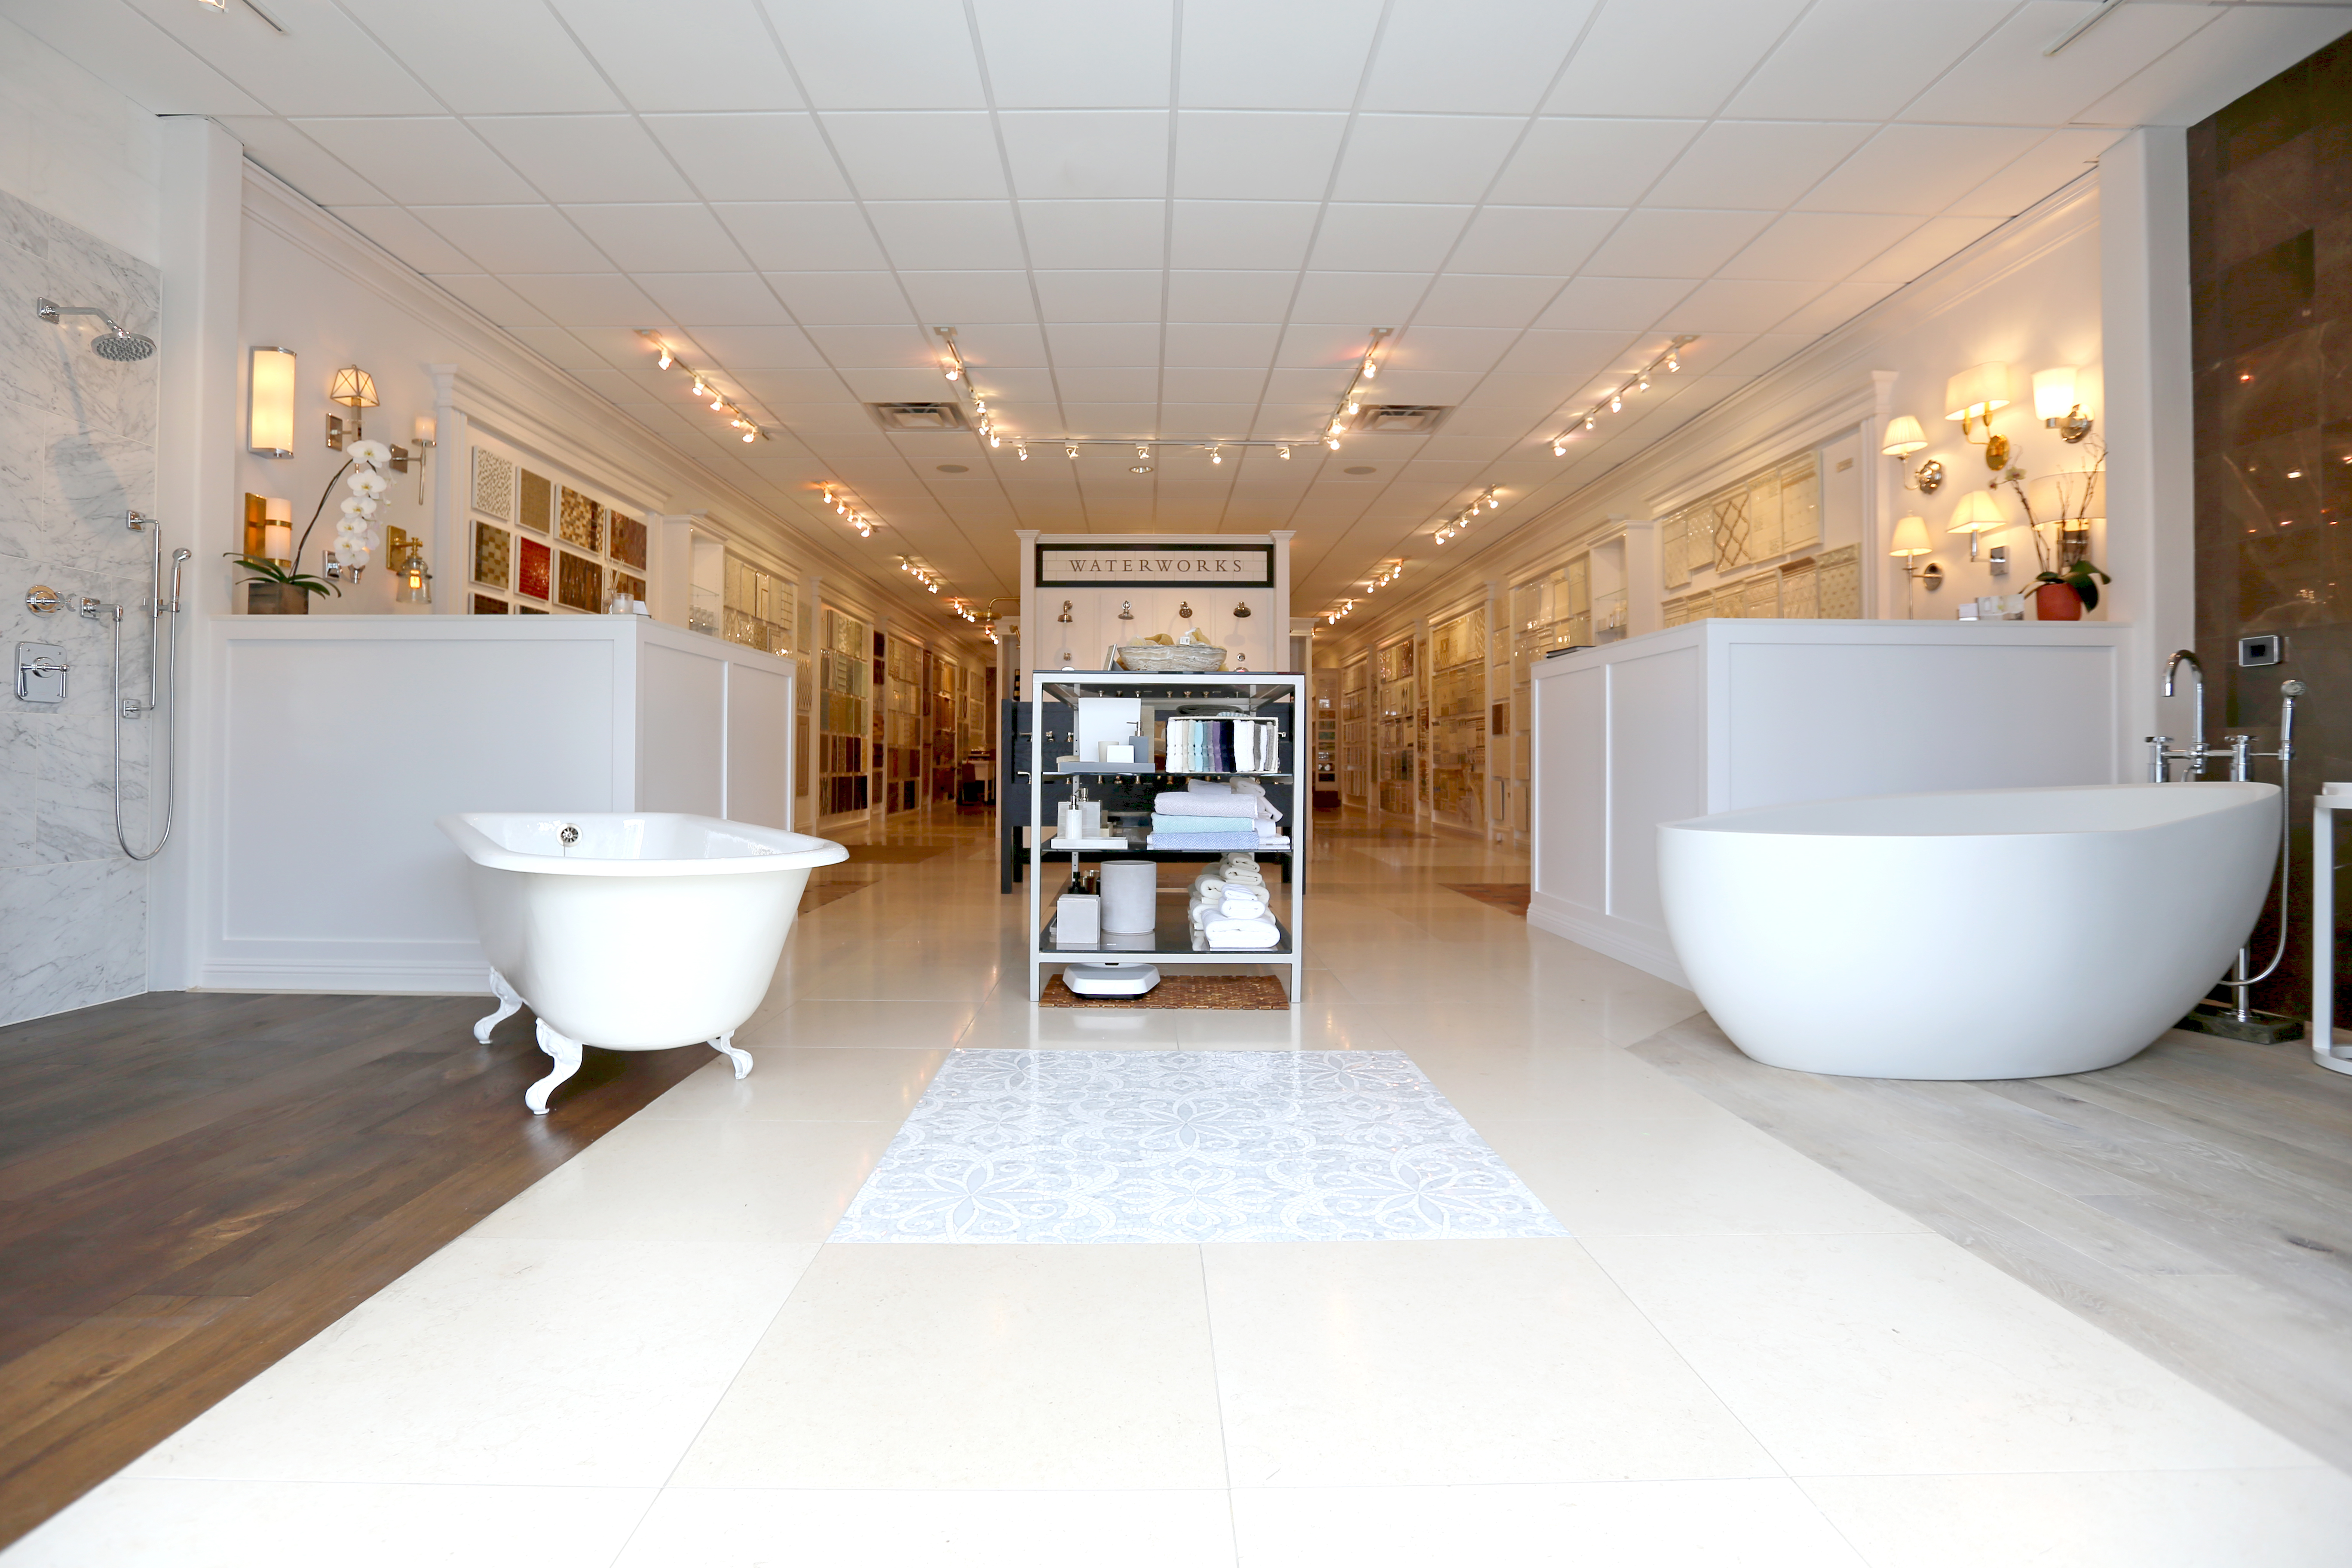 tags kola portfolio showroom studio freelancers of faucet catalog teka bathroom bathtub into visualization zoom fixtures en bath model formentera